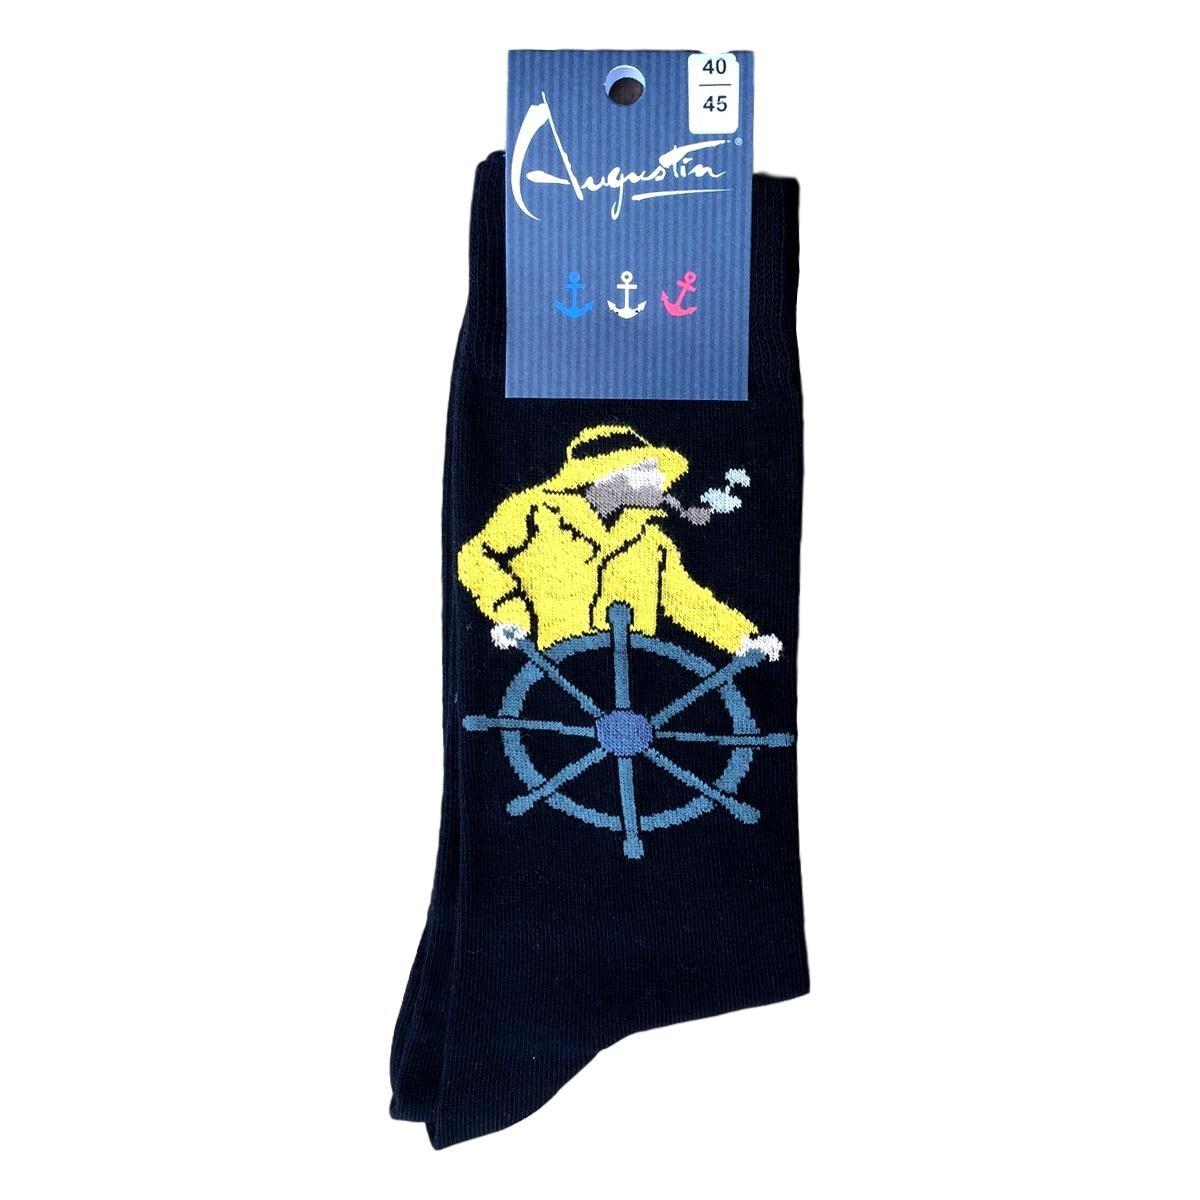 Chaussettes Marin pêcheur